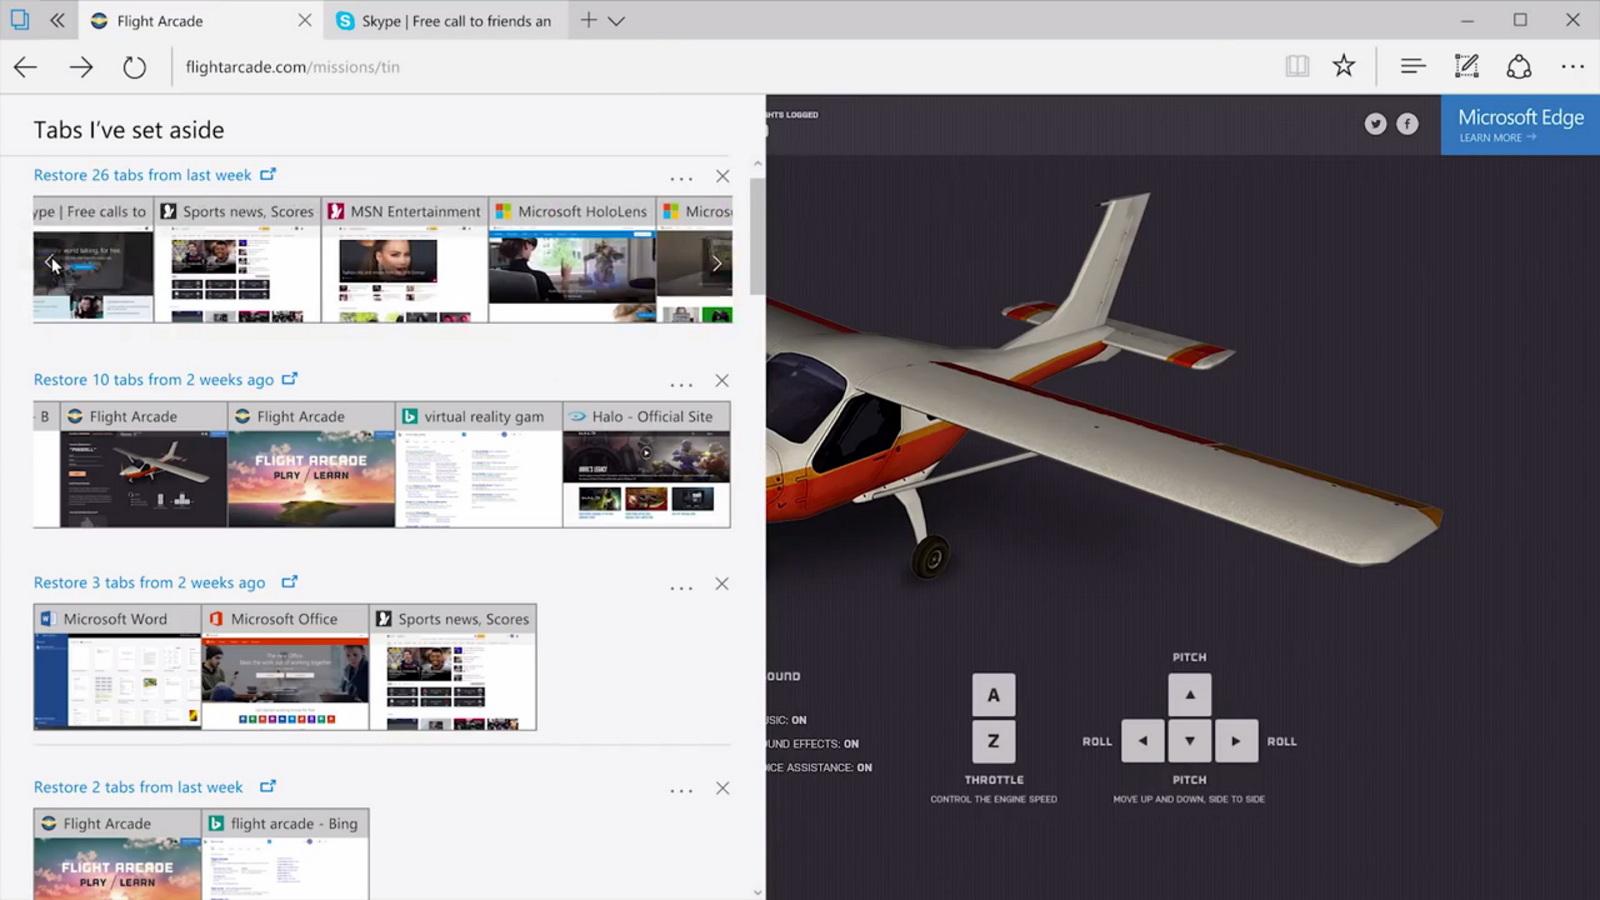 Microsoft Edge new Tabs I've set aside feature